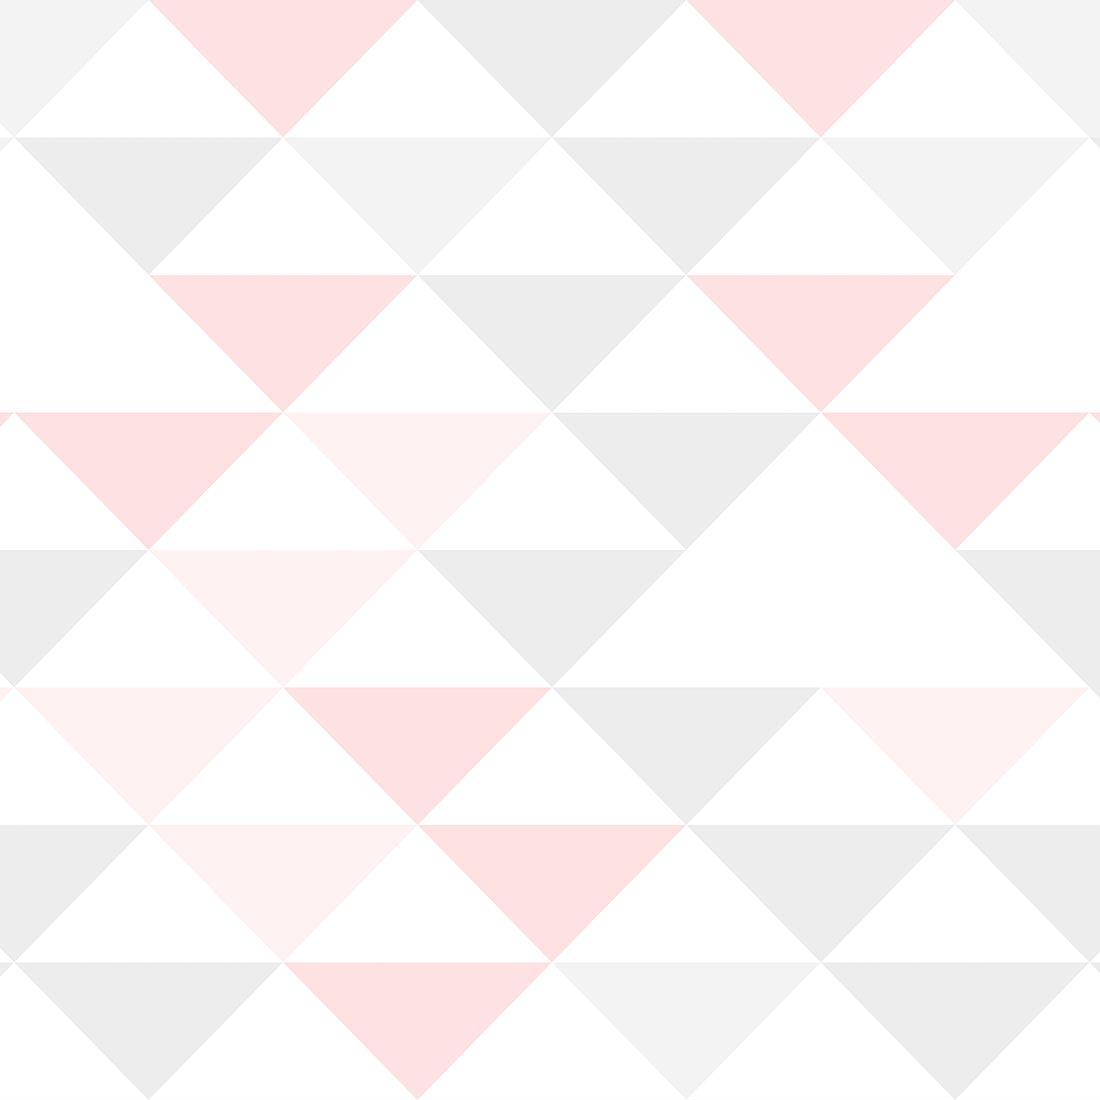 Papel de Parede Geométrico Triângulos Rosa e Cinza